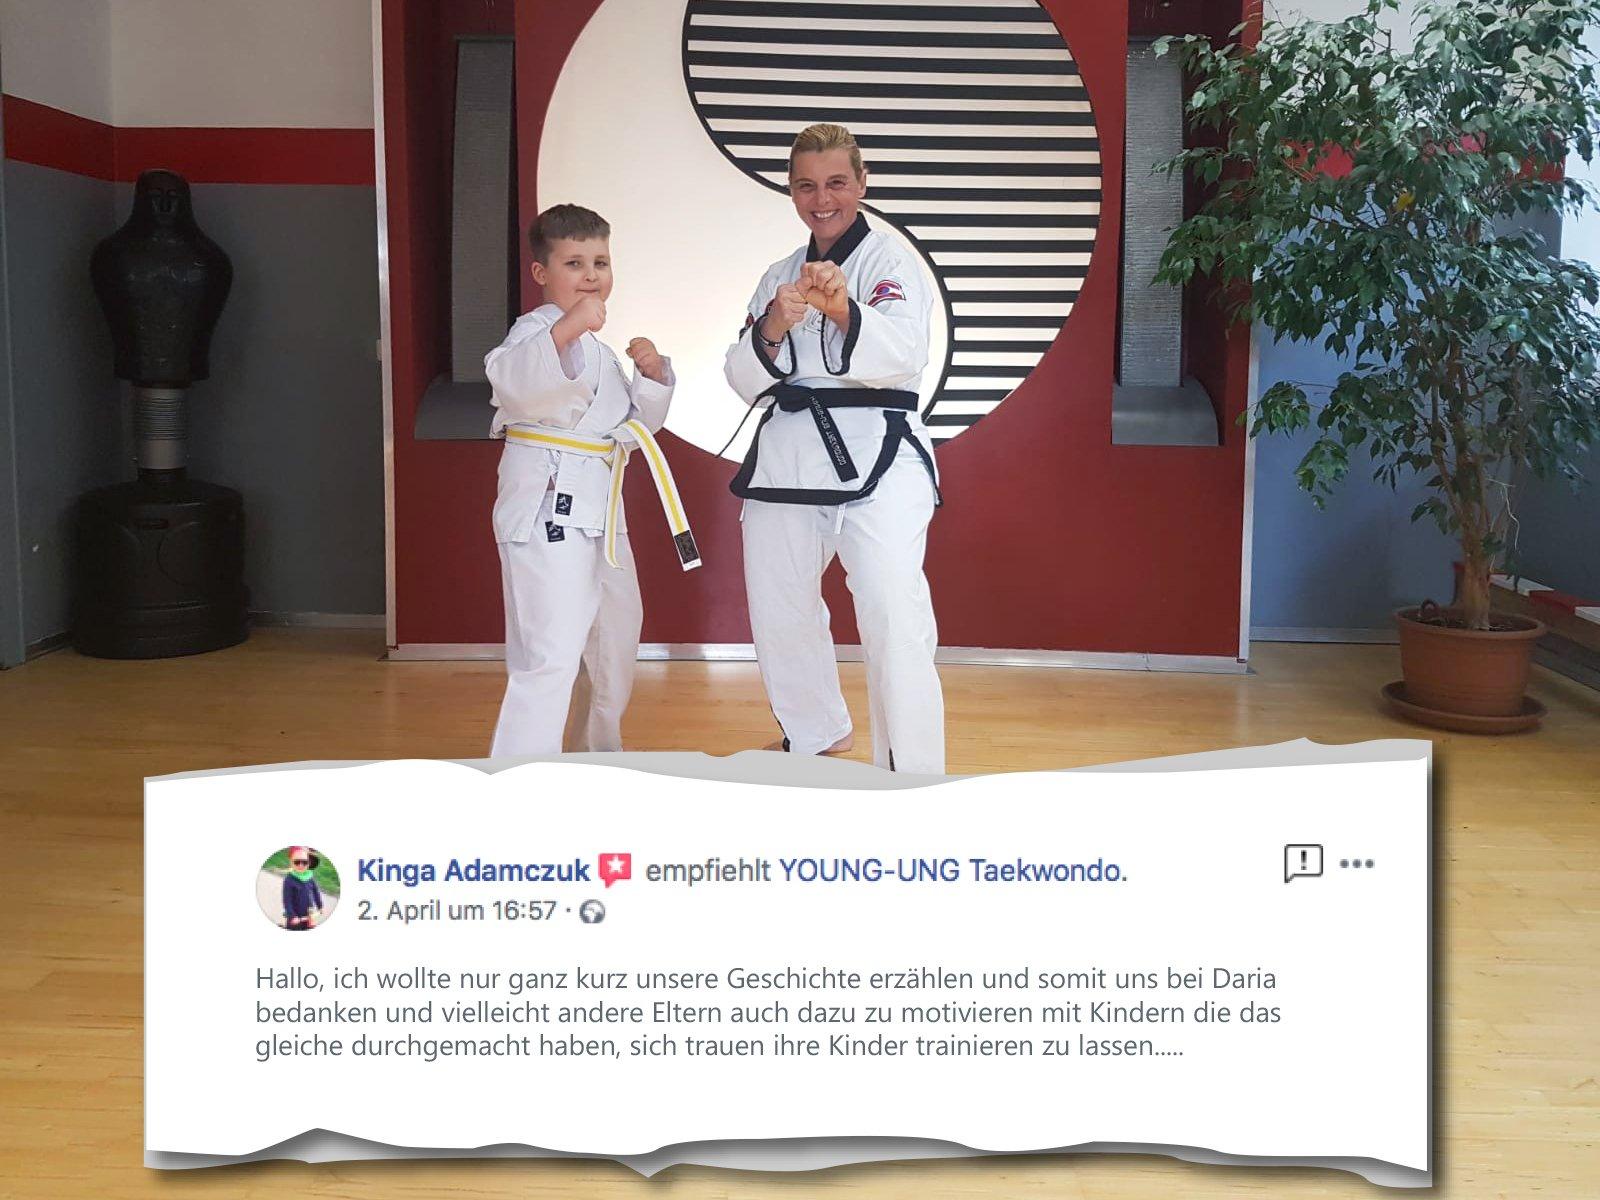 YOUNG-UNG Taekwondo Kampfsport Training Bewertung Lob Kritik Empfehlung